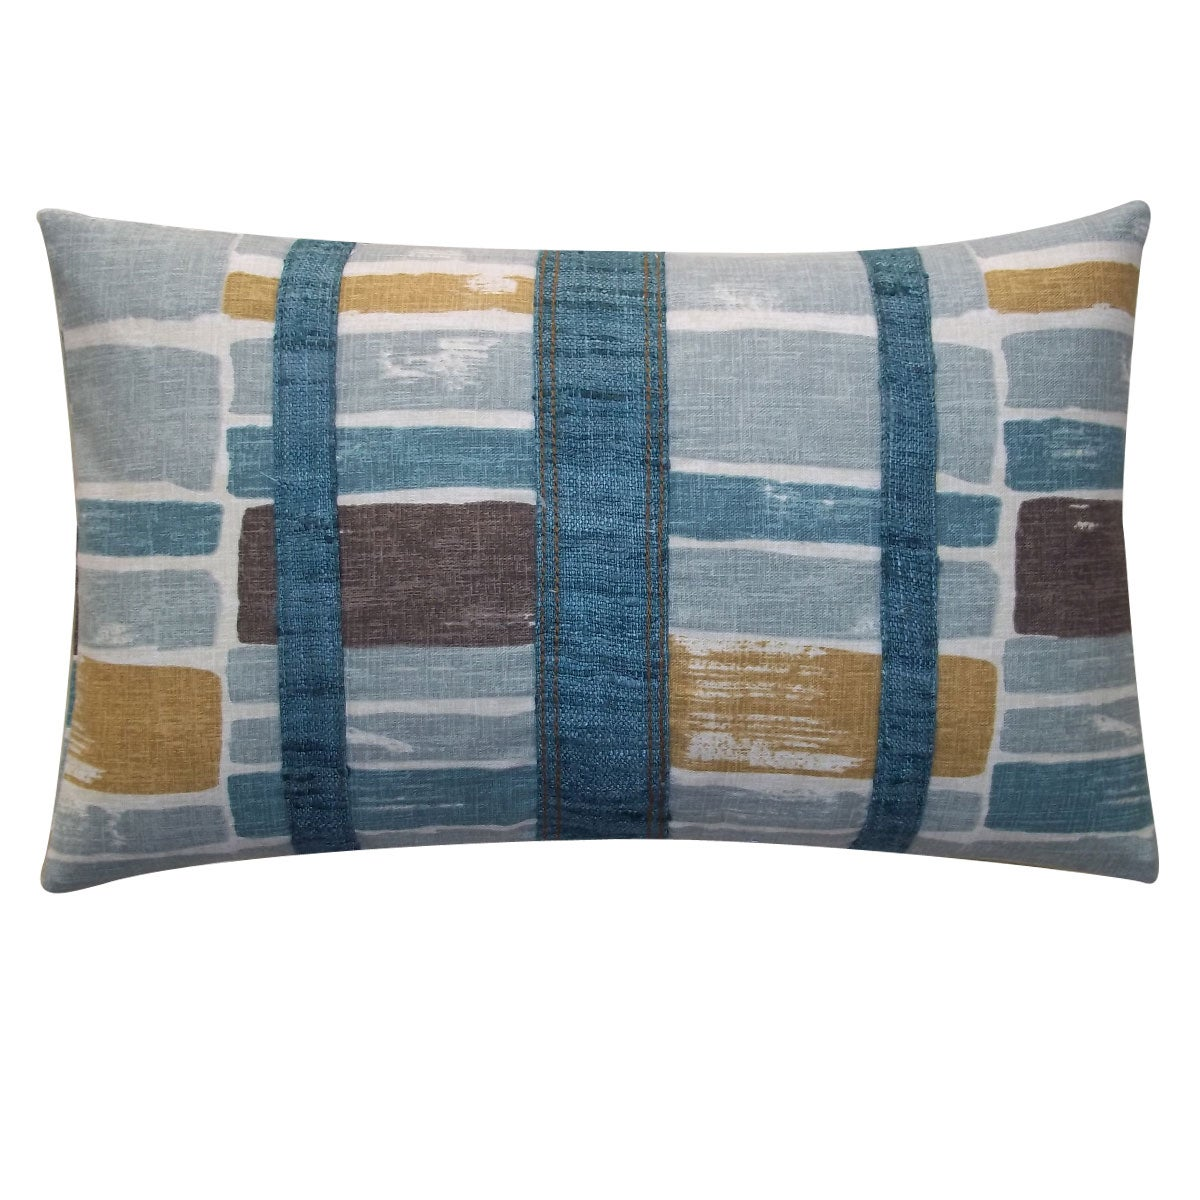 'Martin Patch' Throw Pillow